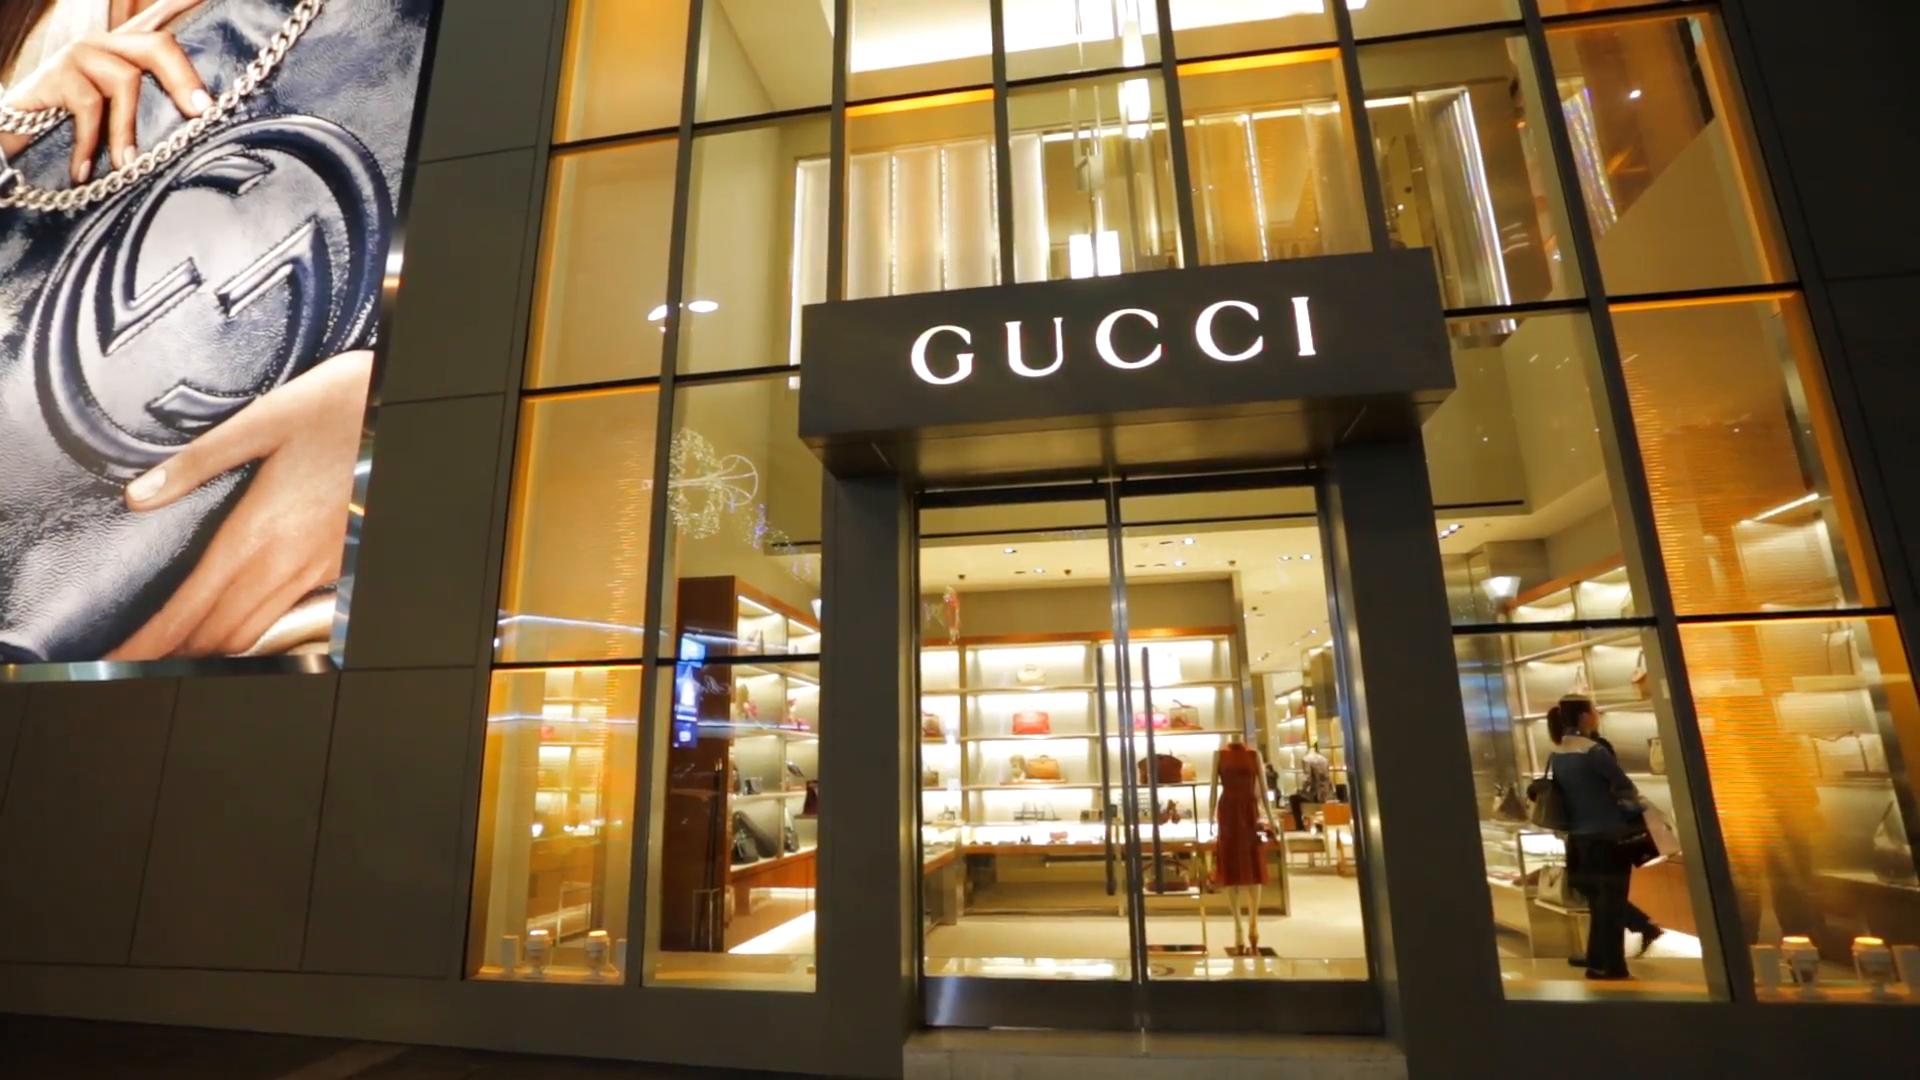 Harga Tas Gucci Tidak Sesuai dengan Harga Bahan yang Digunakan